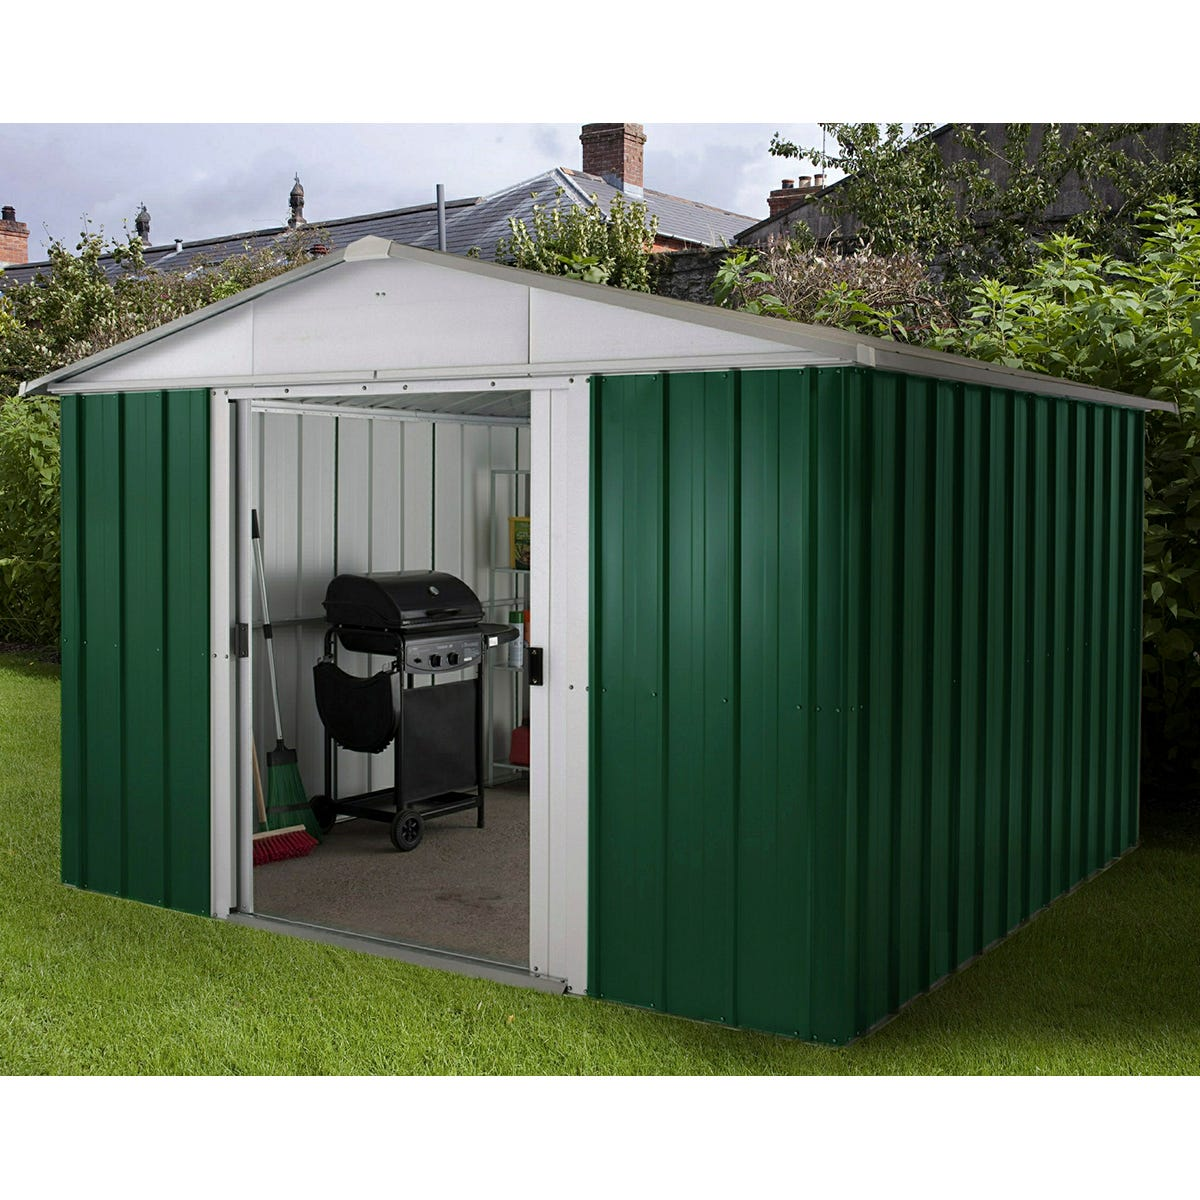 Yardmaster Emerald No Floor Metal Apex Shed 10 x 10ft